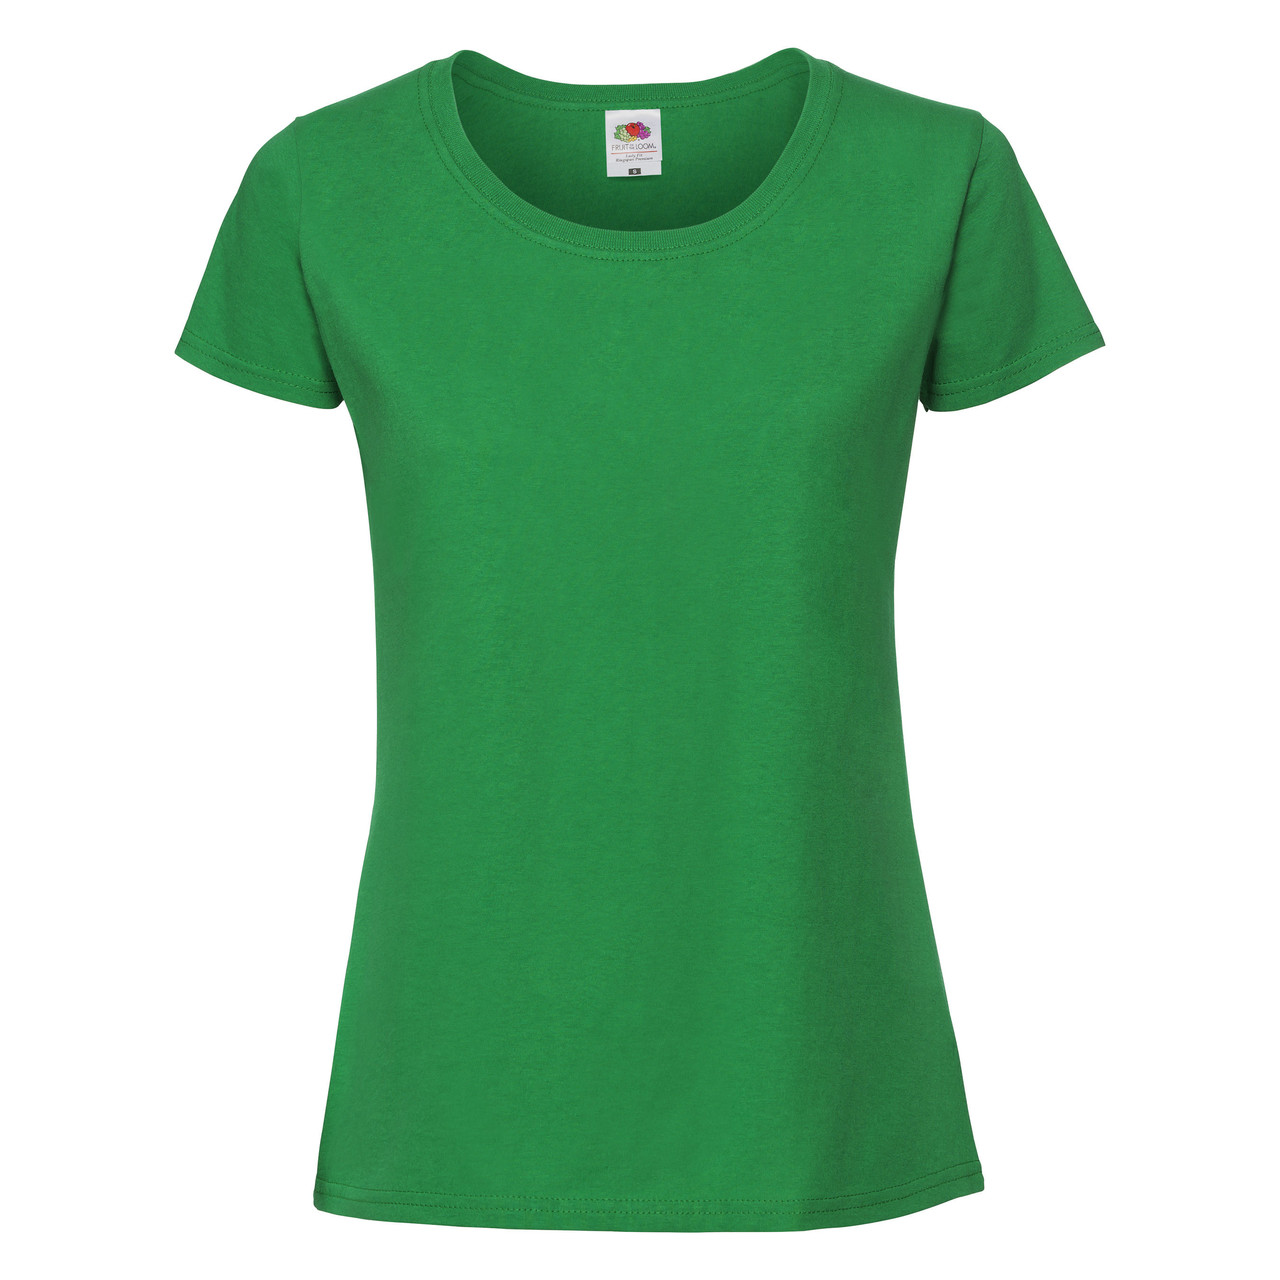 Женская Футболка Премиум  Ярко-зелёная  Fruit of the loom 61-424-47 L